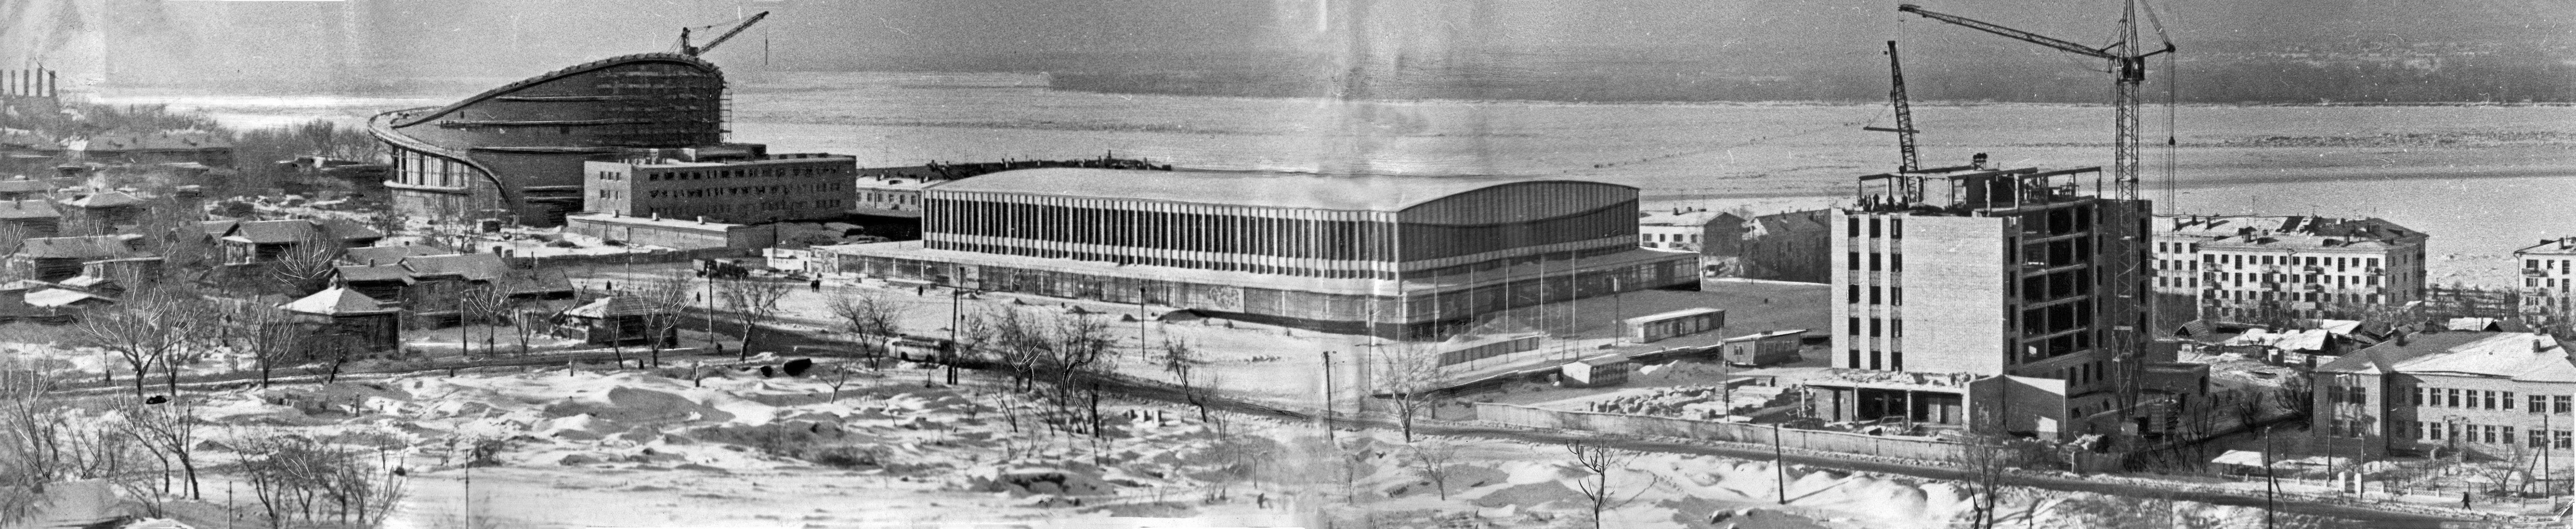 Март 1969 года